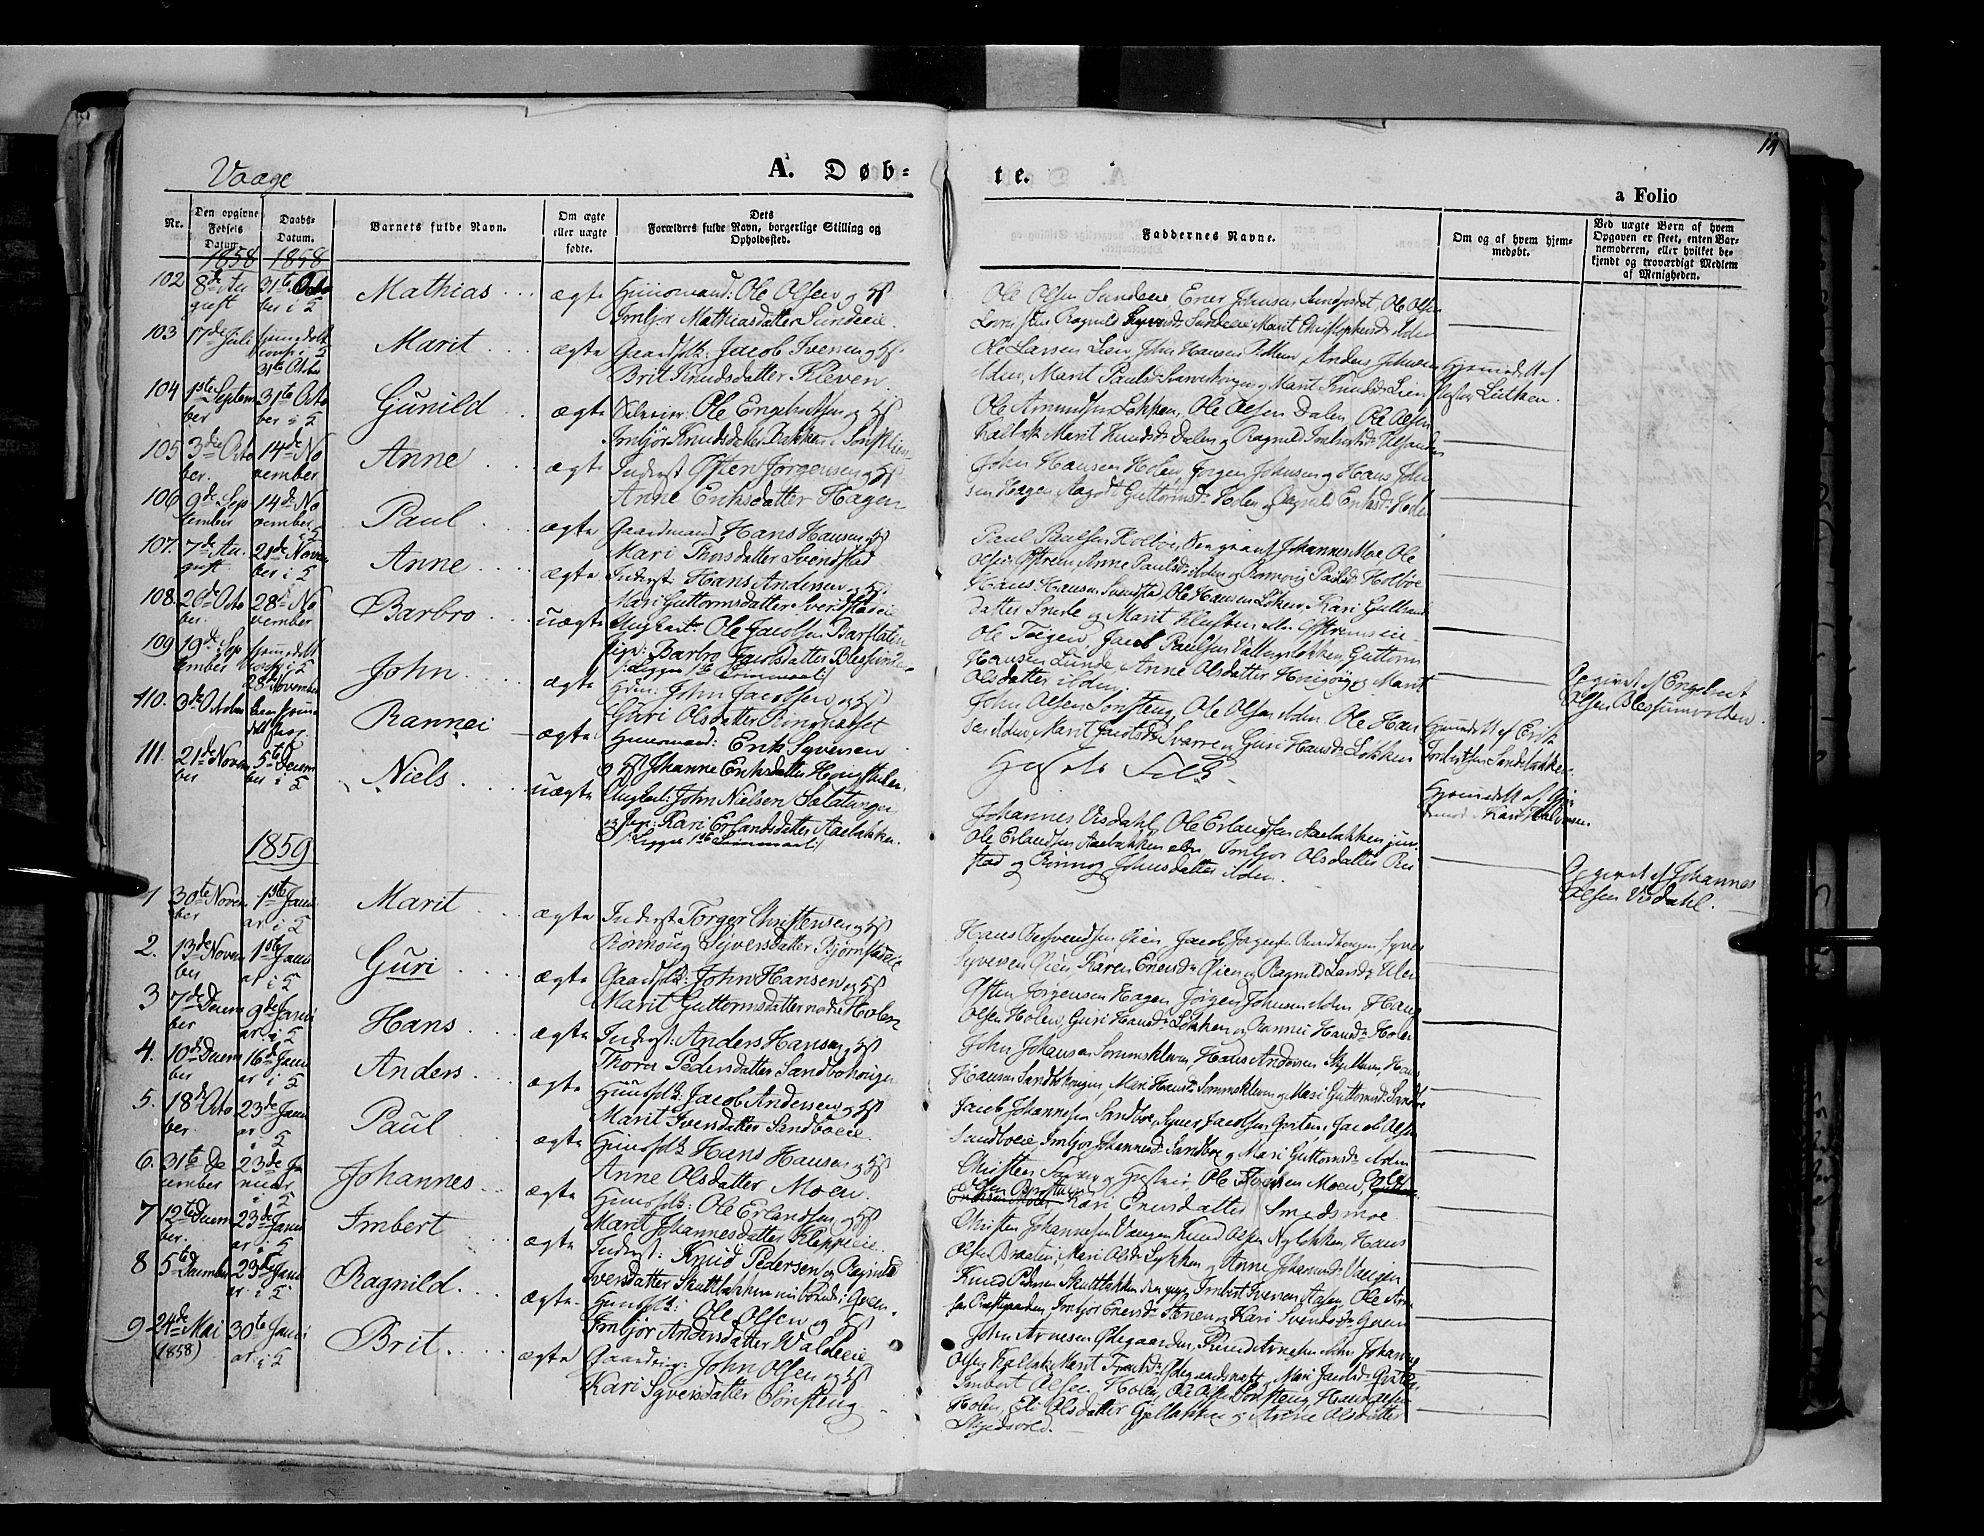 SAH, Vågå prestekontor, Ministerialbok nr. 6 /1, 1856-1872, s. 14